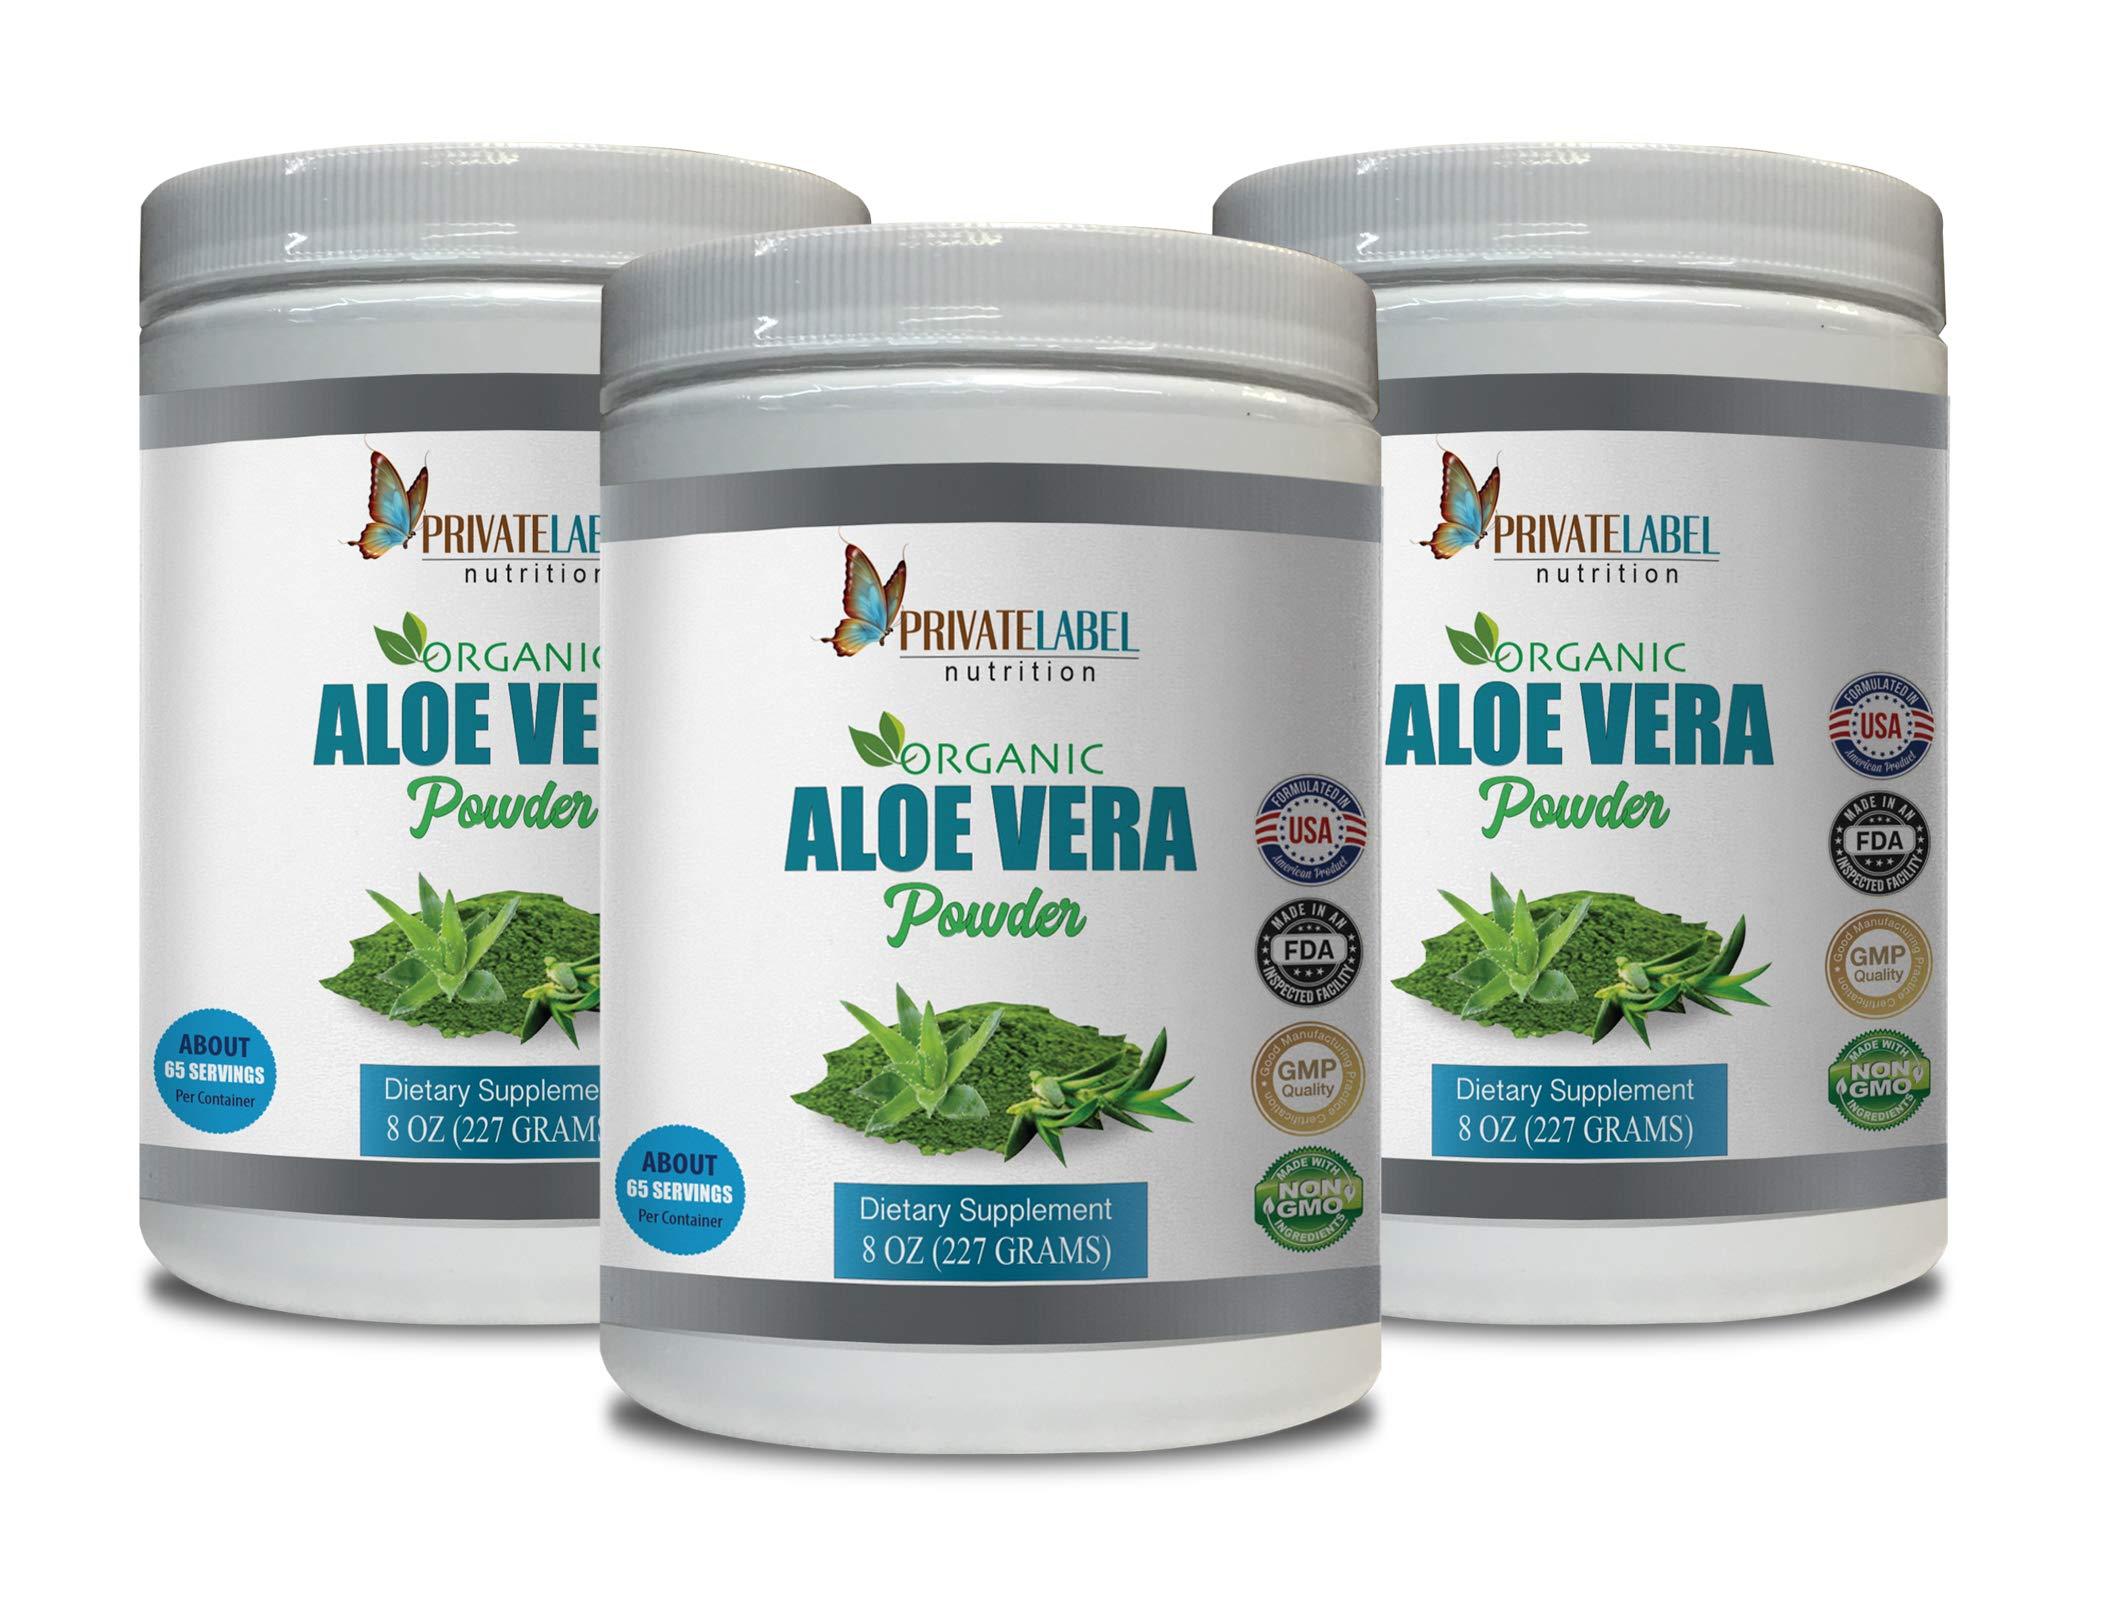 Cardiovascular Enhancement - Aloe Vera Organic Powder - Aloe Vera Vitamins - 3 Cans 24 OZ (195 Servings)